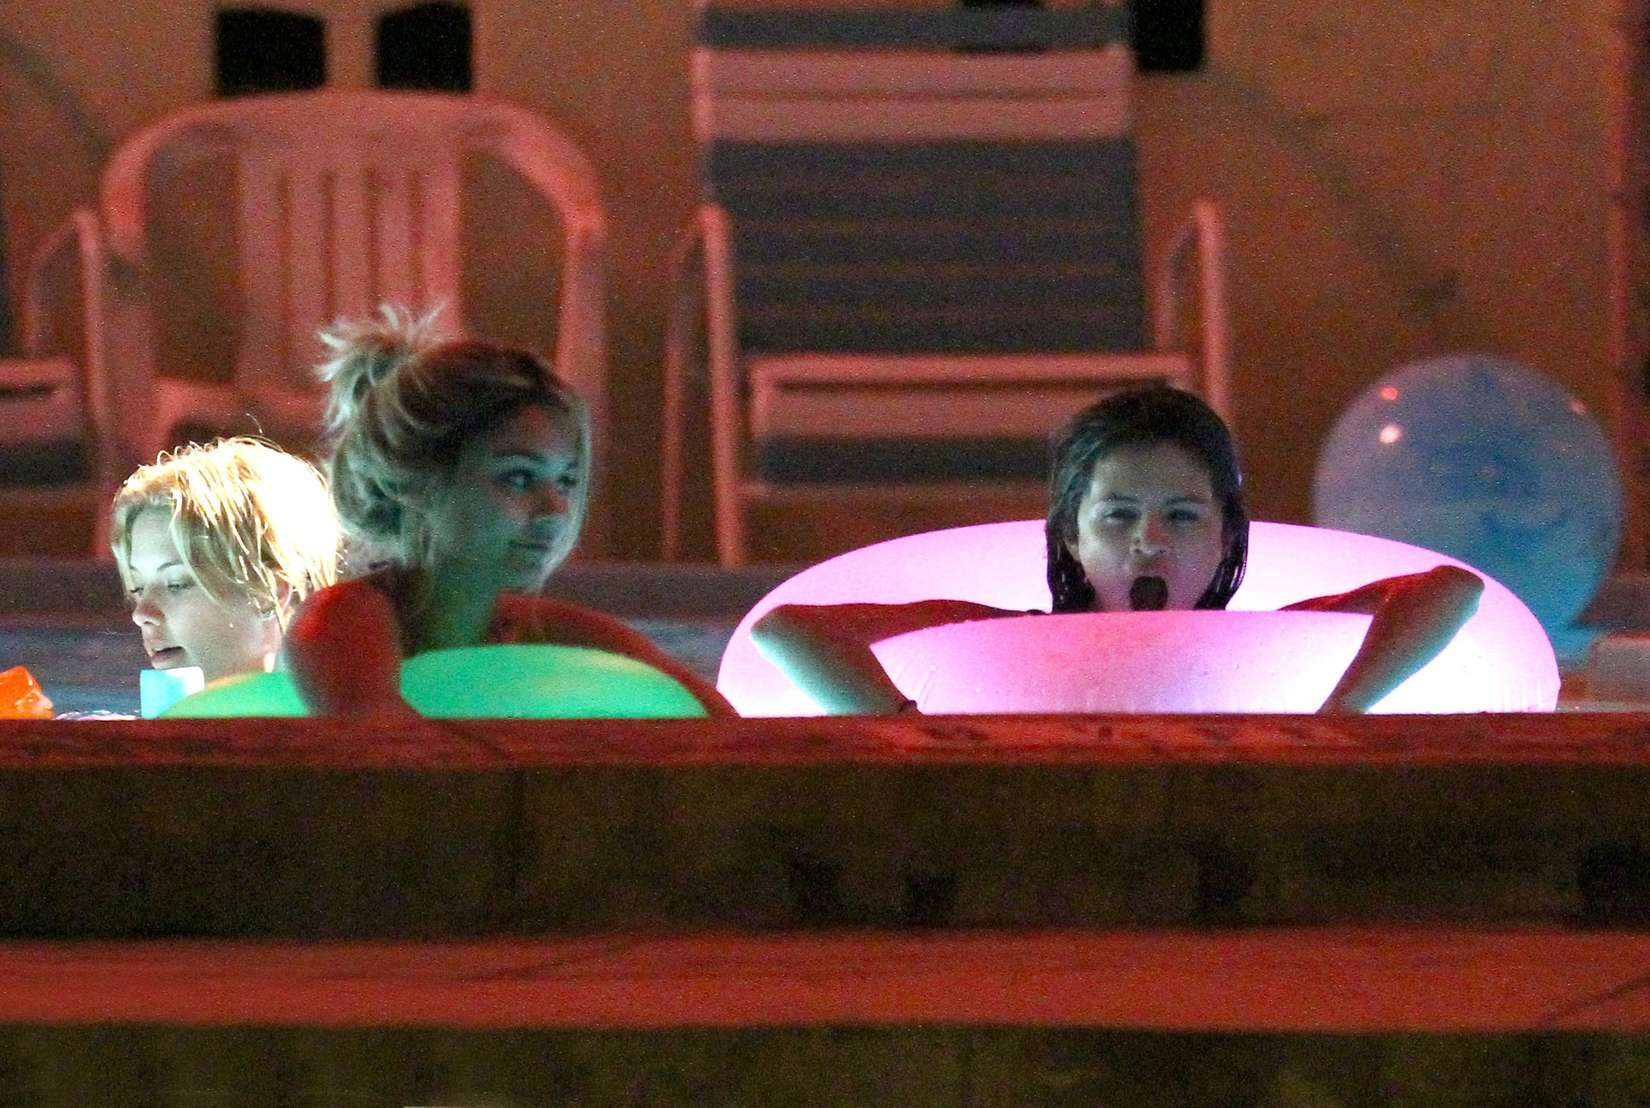 Selena Gomez And Vanessa Hudgens Bikini Pool Party On Set Of Spring Breakers 01 Gotceleb